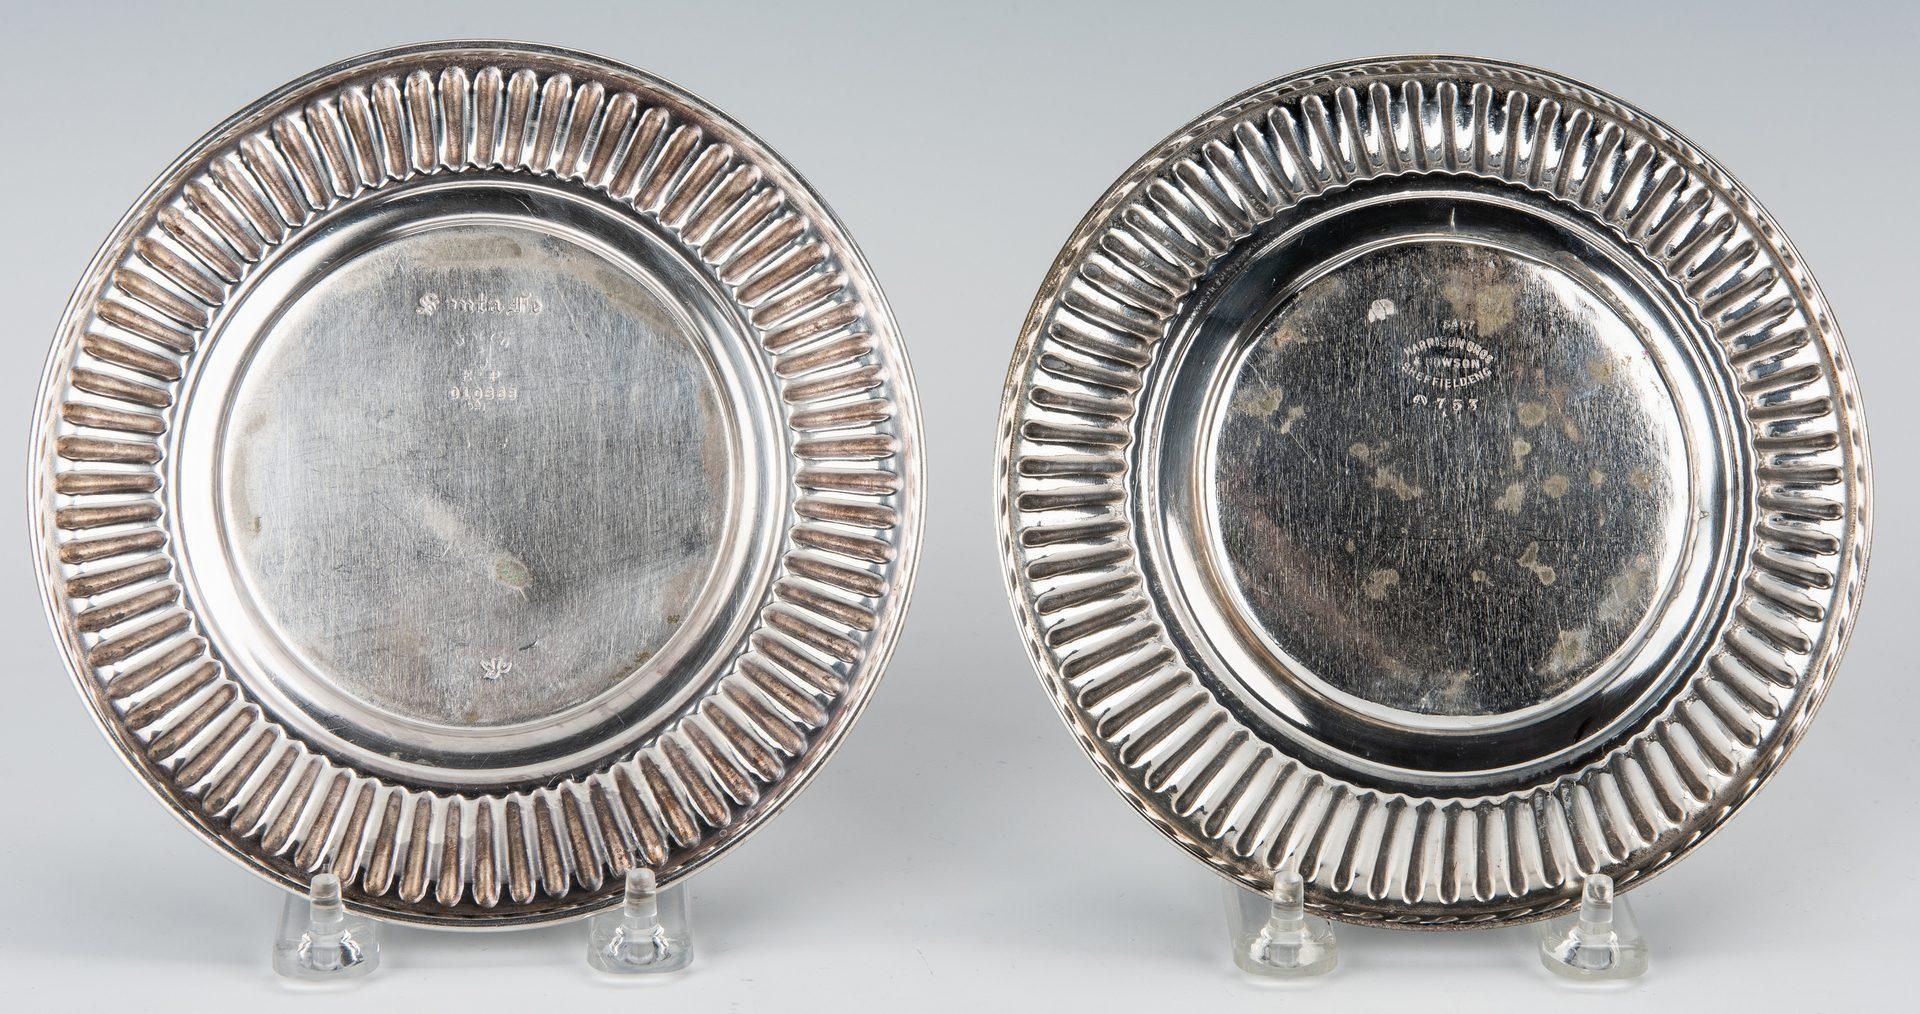 Lot 355: 5 pieces Santa Fe Railroad Silver